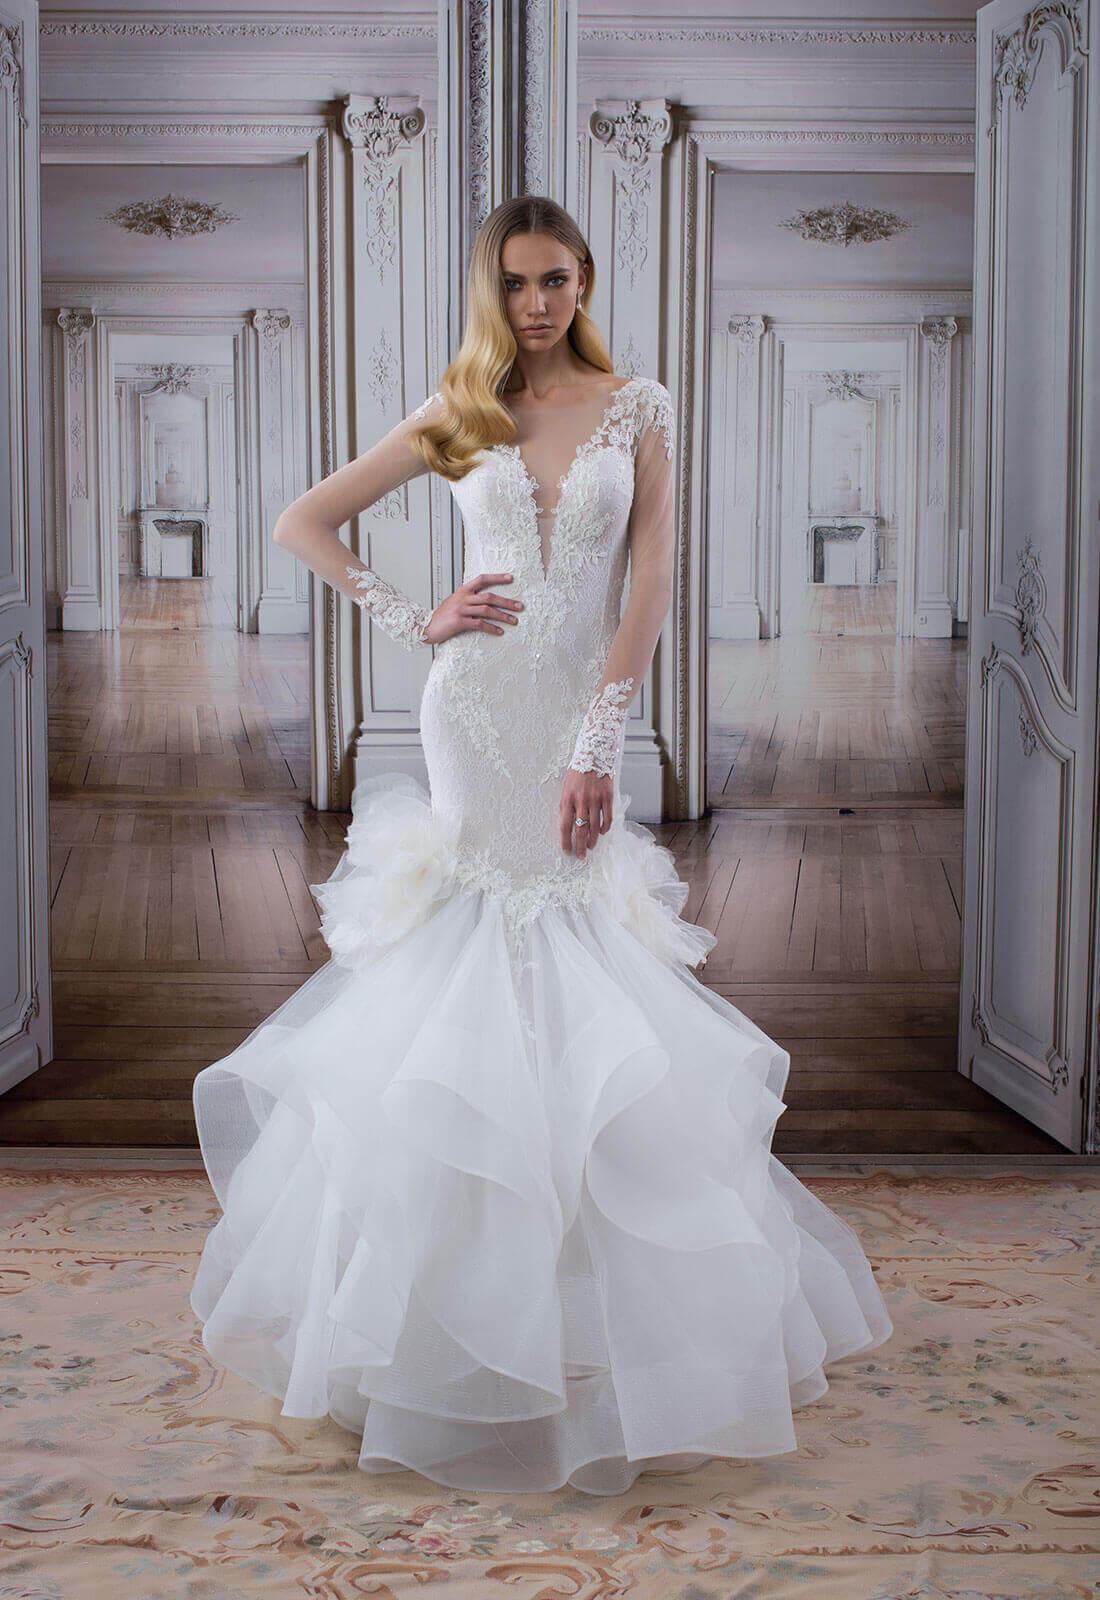 Bride Dress One Level Up Contest